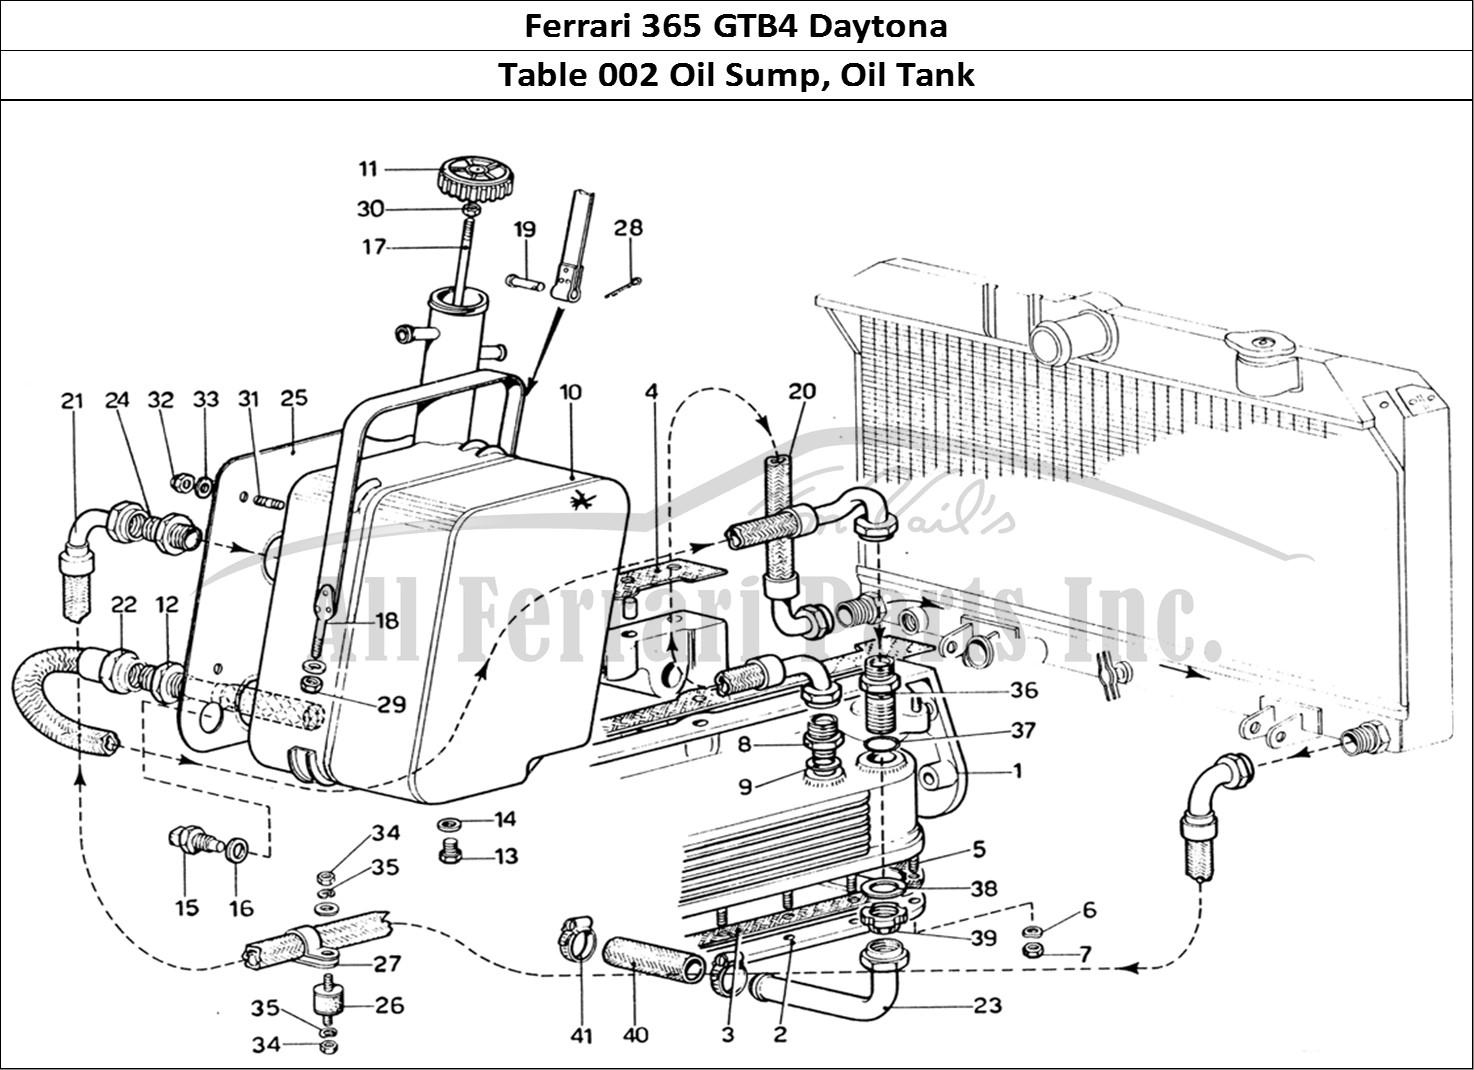 Buy original Ferrari 365 GTB4 Daytona 002 Oil Sump, Oil